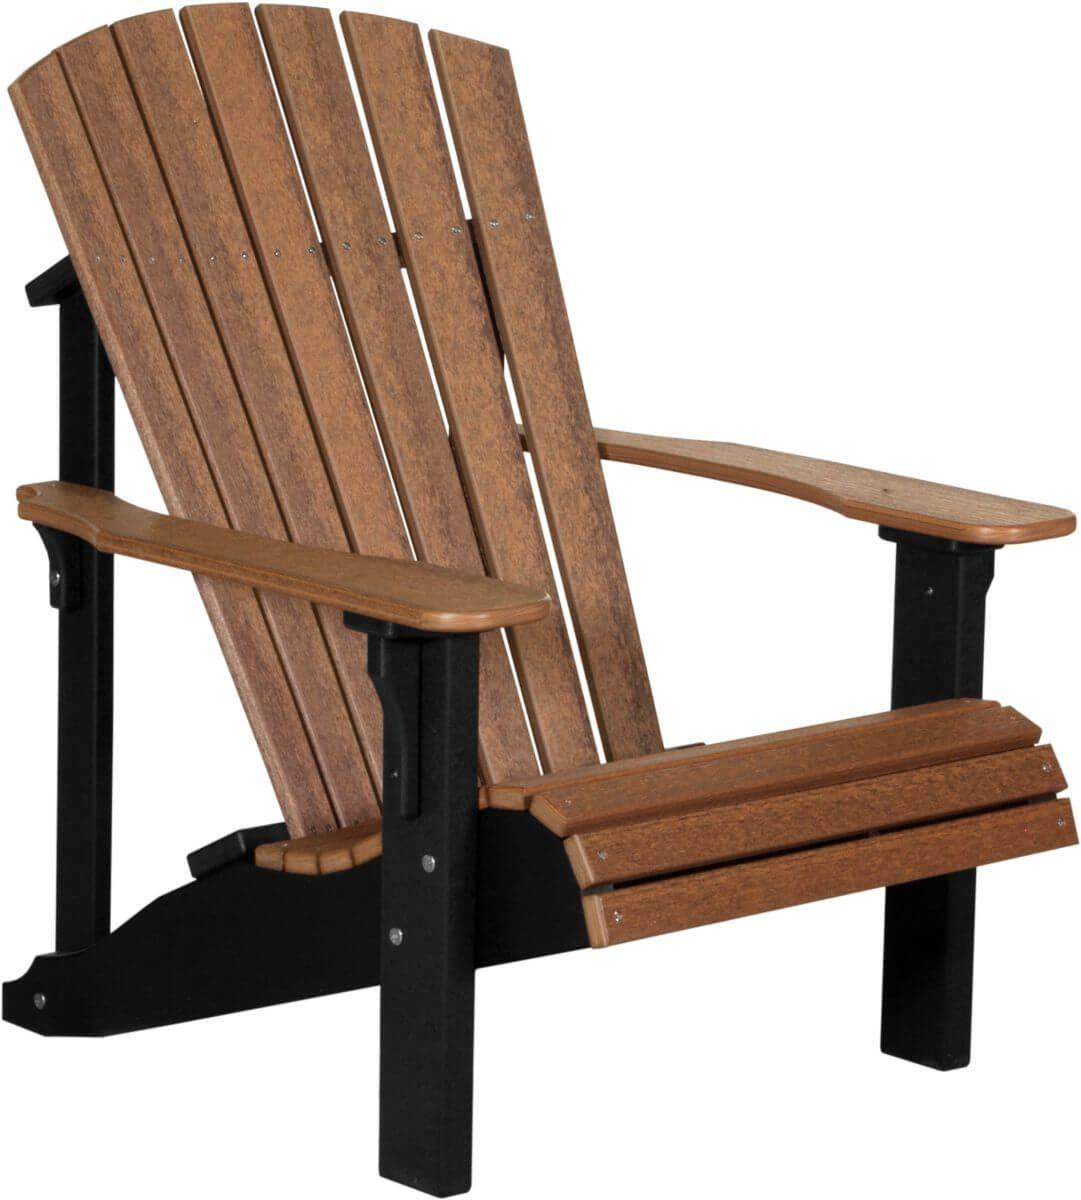 Antique Mahogany and Black Rockaway Adirondack Chair